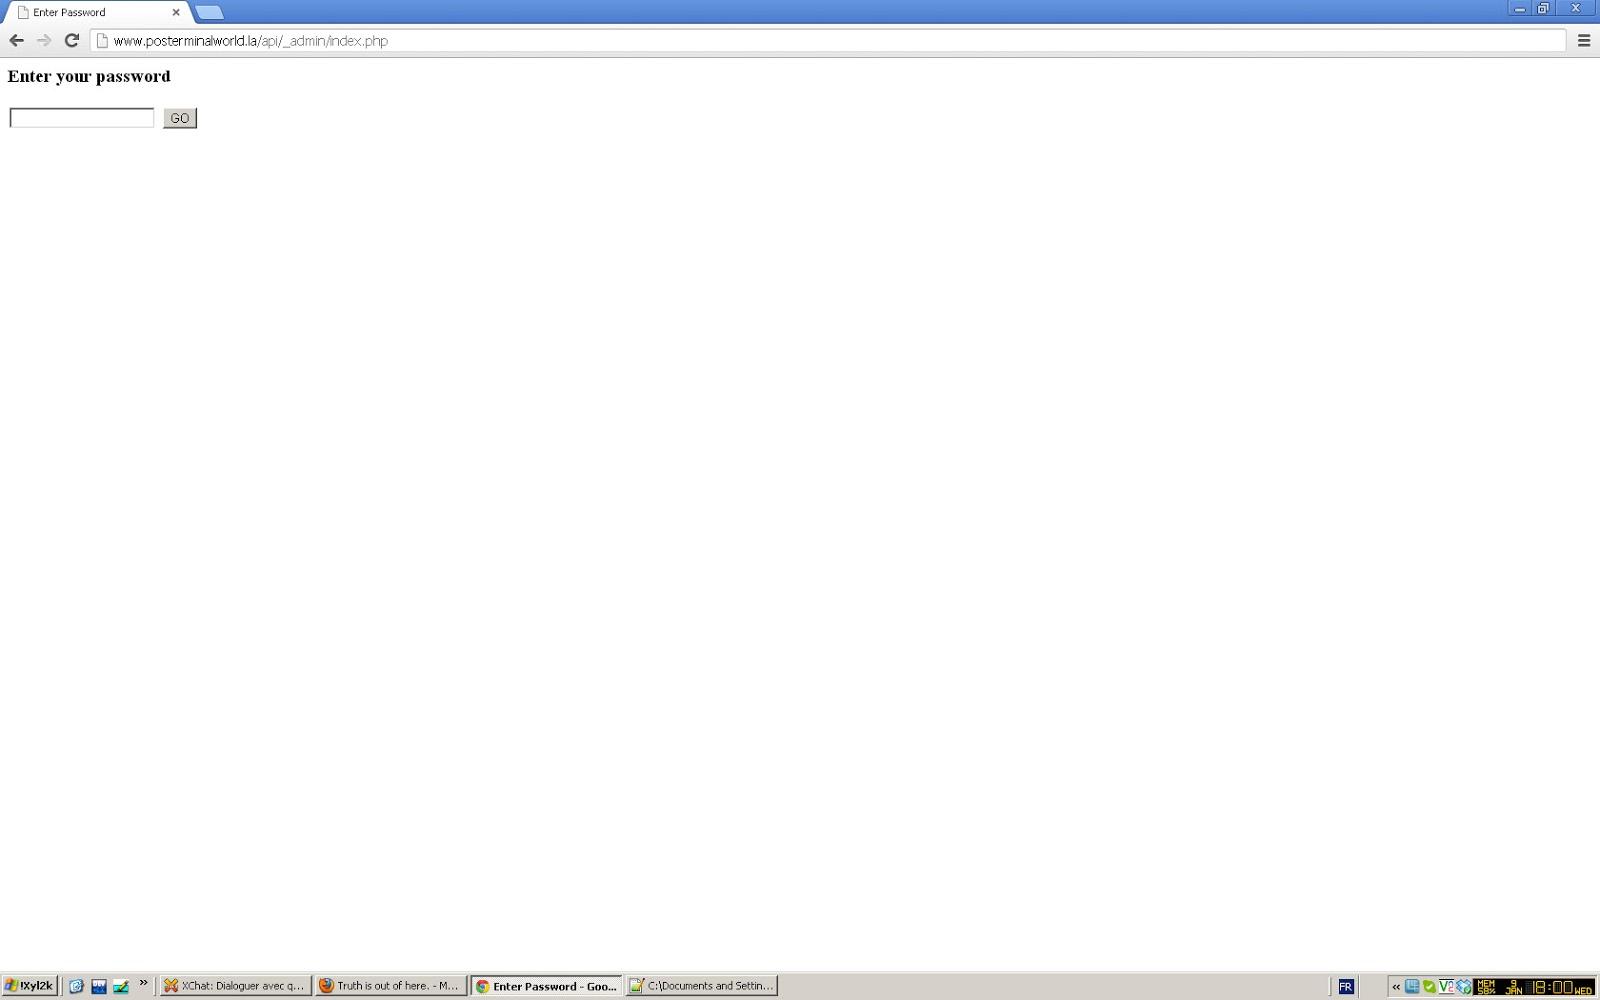 XyliBox: vSkimmer, Another POS malware